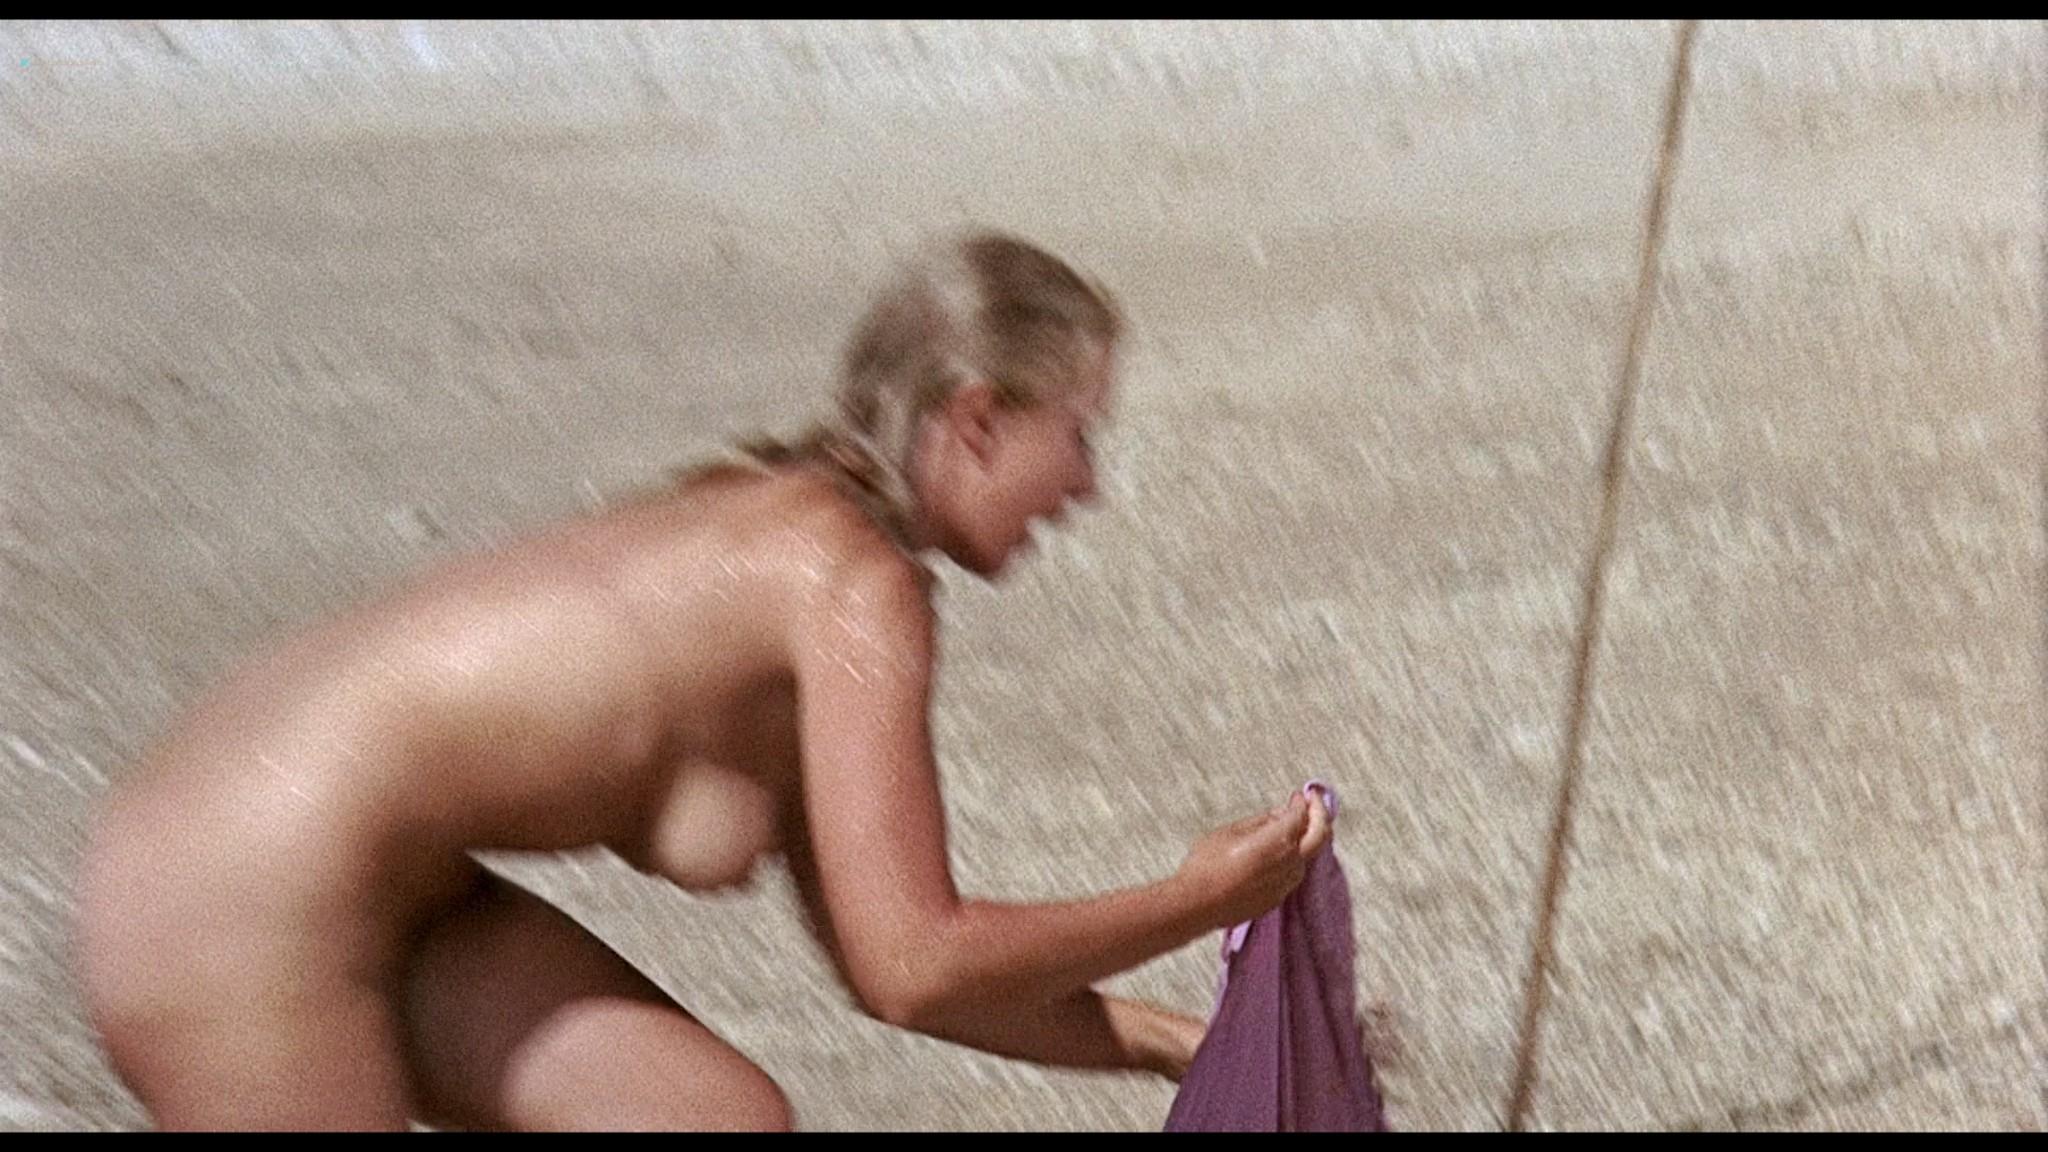 Helen Mirren nude skinny dipping Clarissa Kaye-Mason nude sex - Age of Consent (1969) HD 1080p BluRay Remux (2)